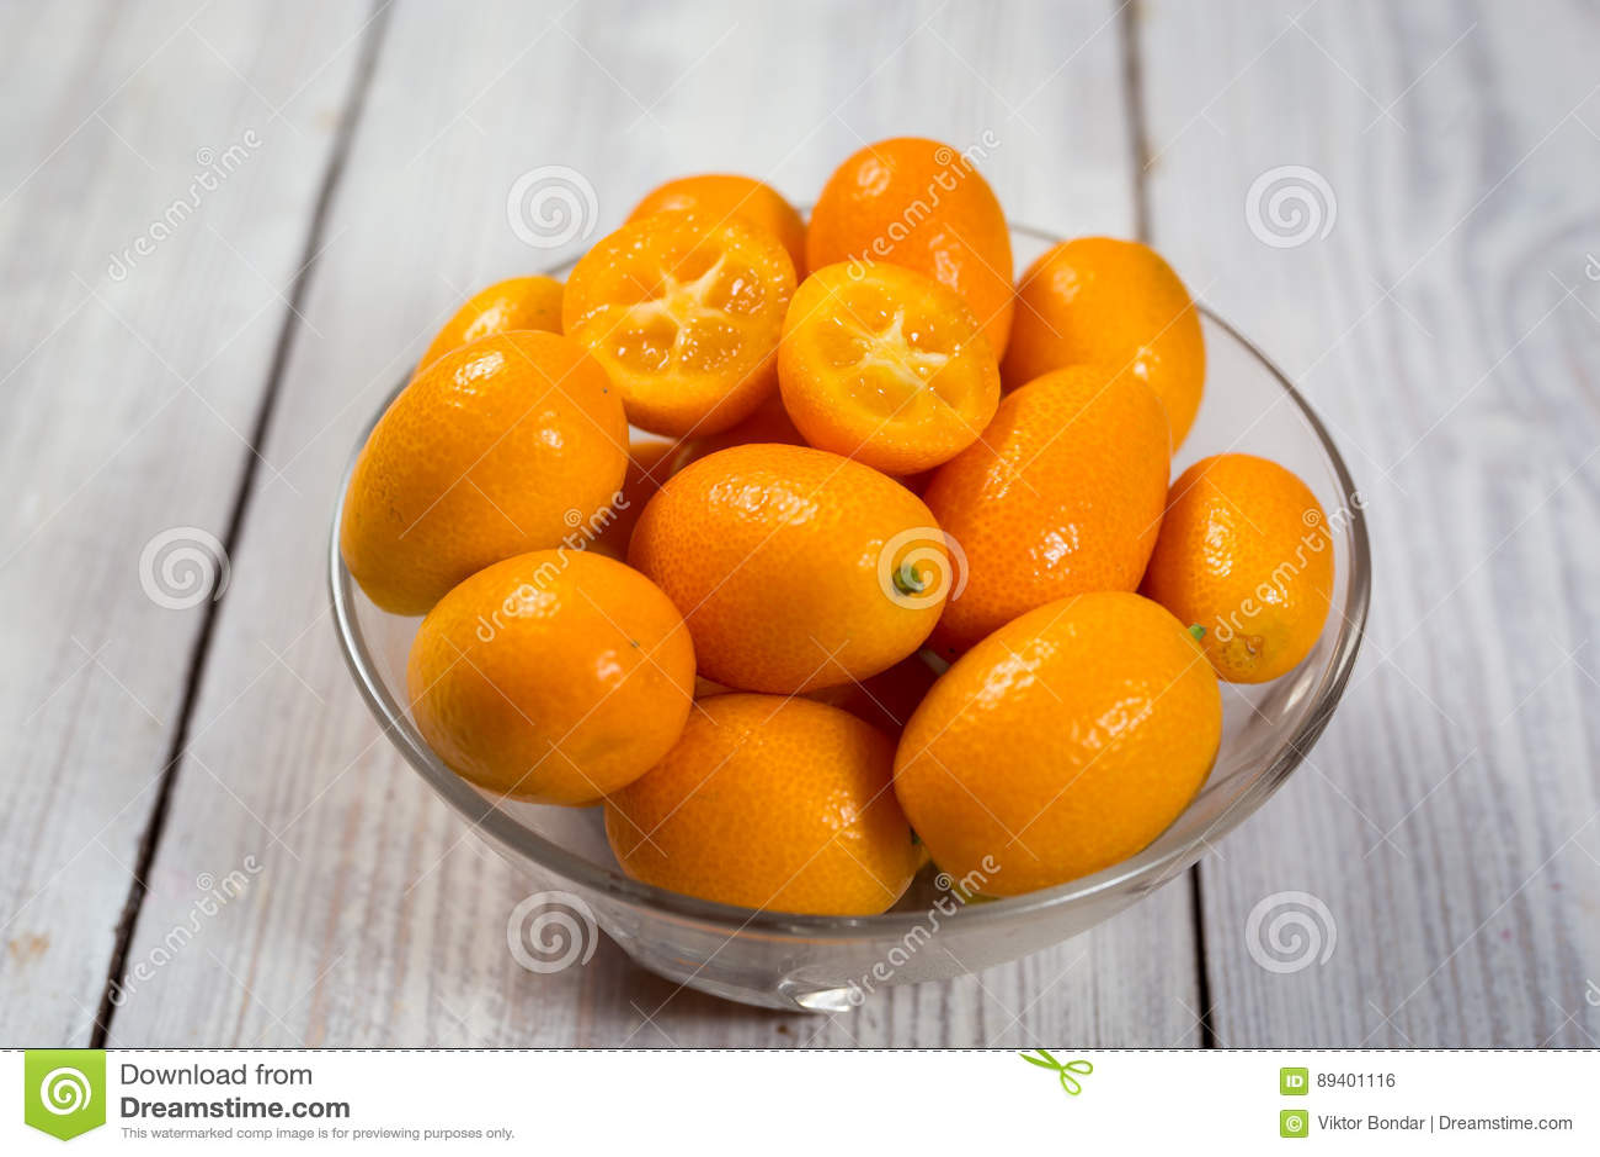 Dieta de naranja china